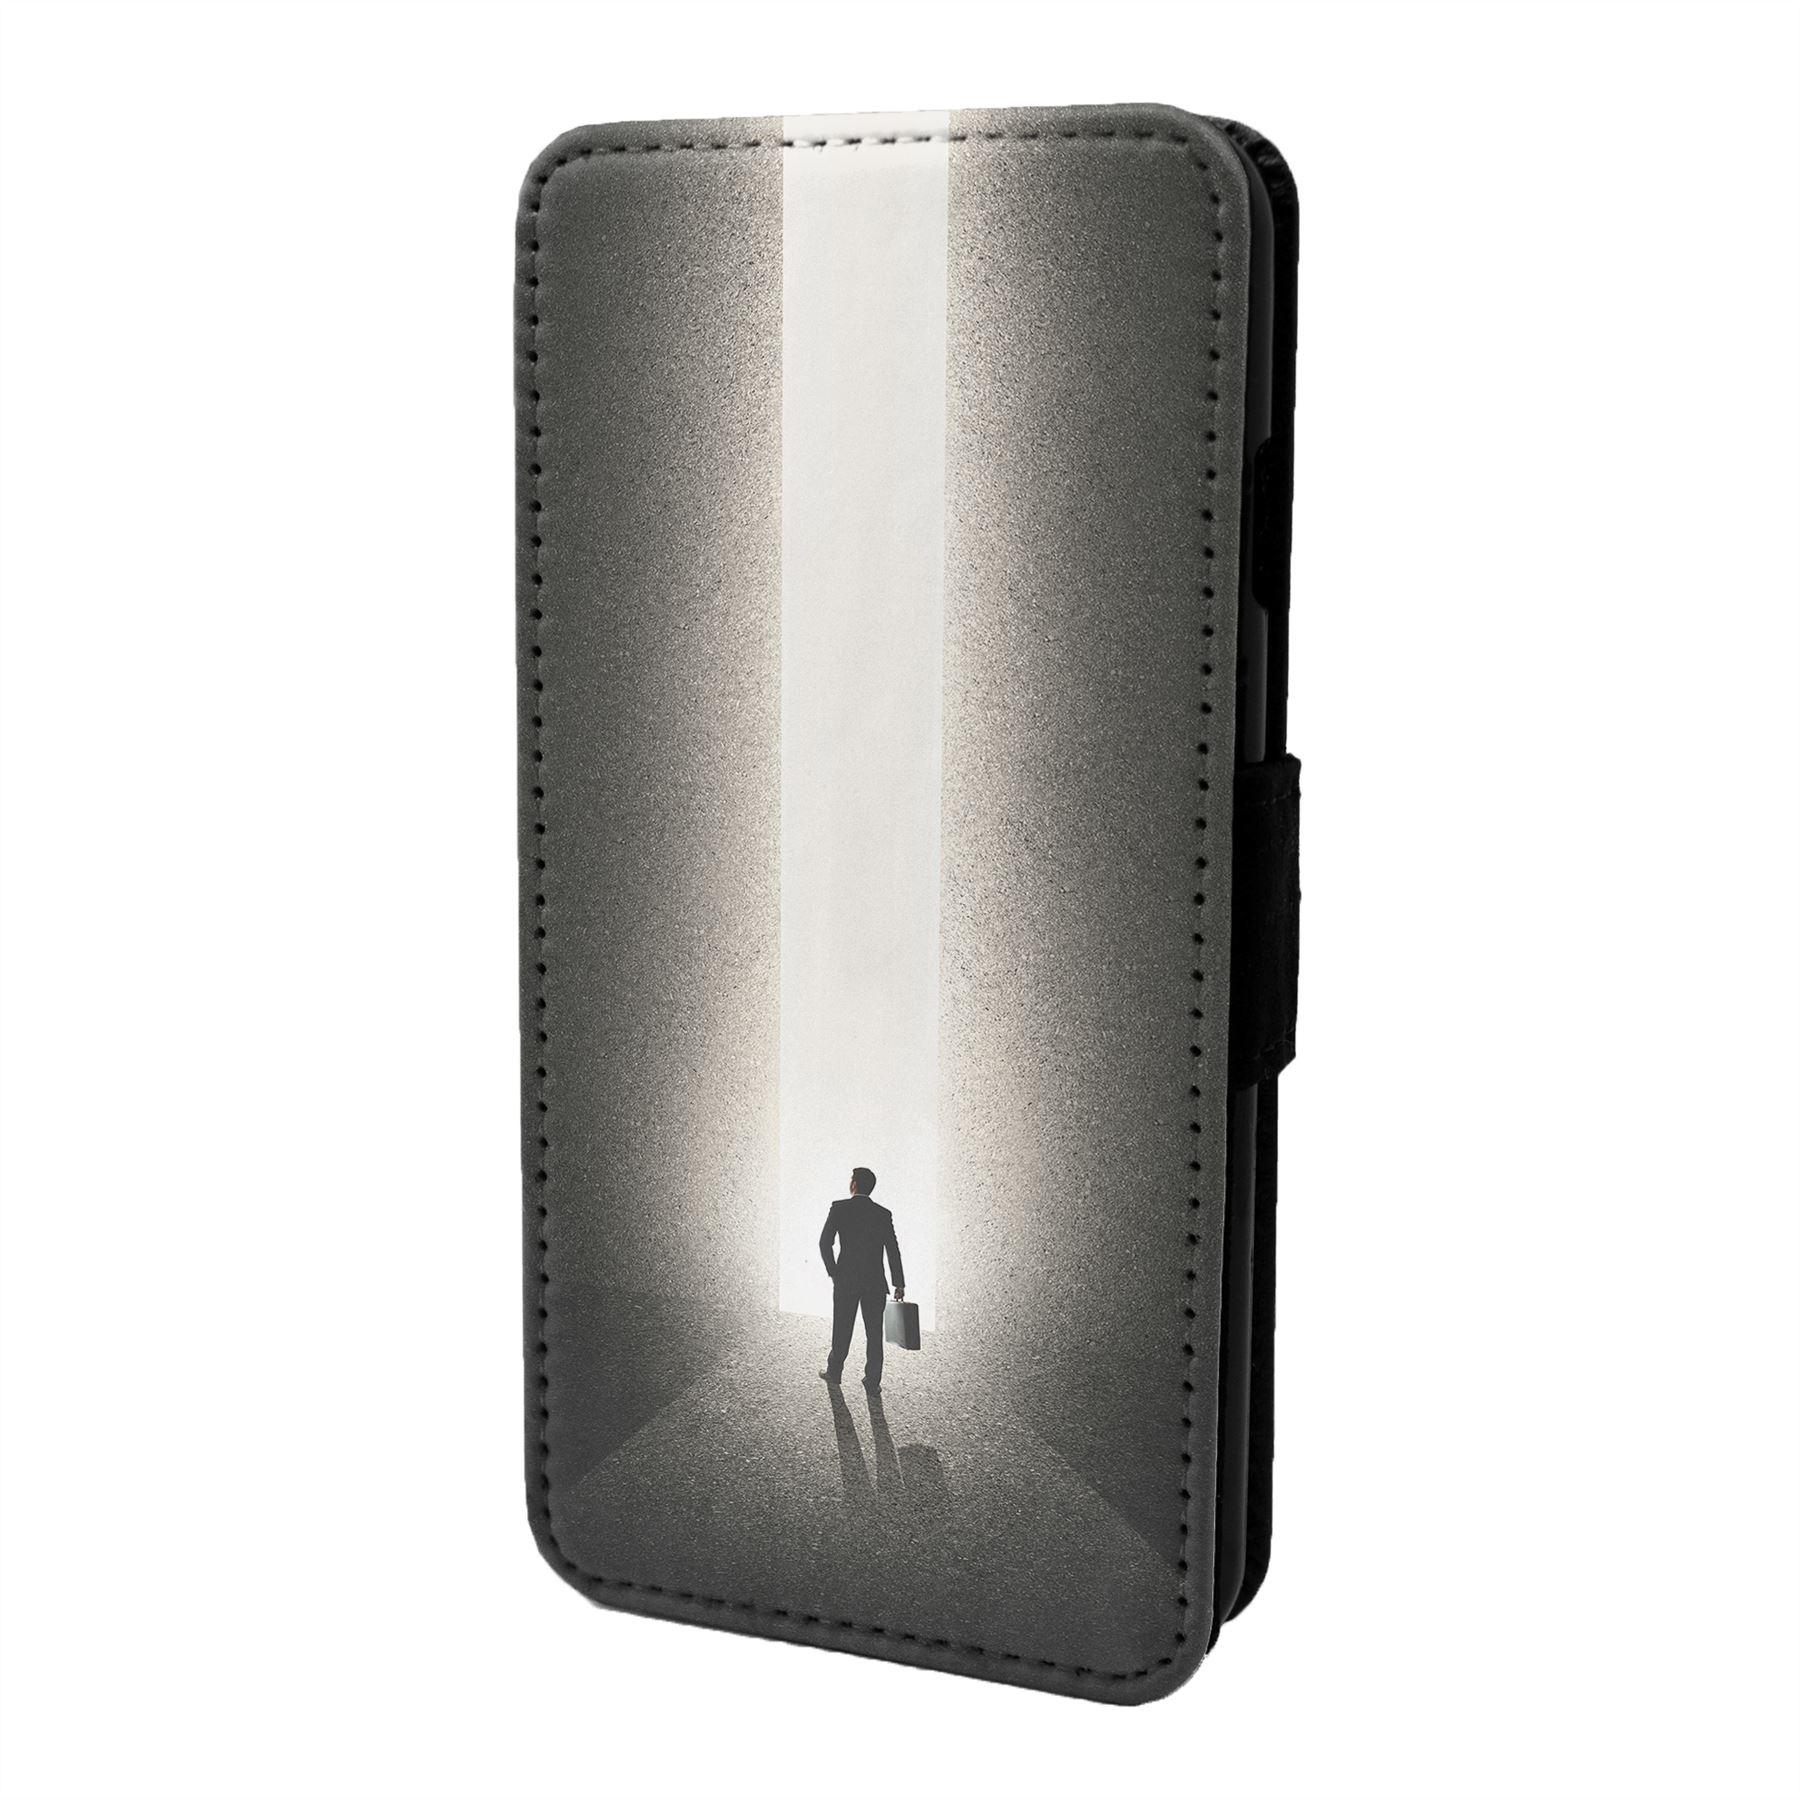 Minimal-Leger-Imprime-Etui-Rabattable-pour-Telephone-Portable-S6920